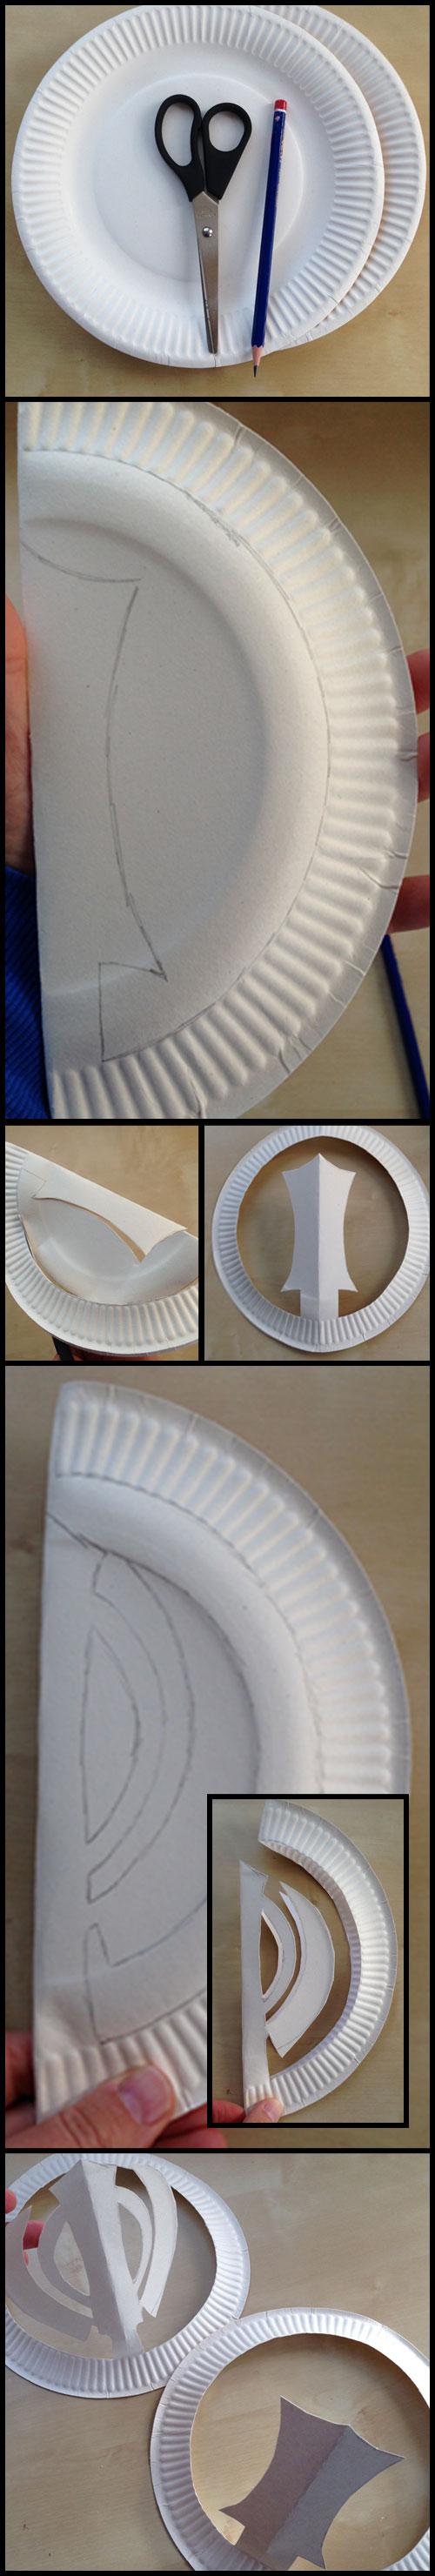 Khanda Chakkr paper plate Sikhi craft tutorial - Kiddie Sangat